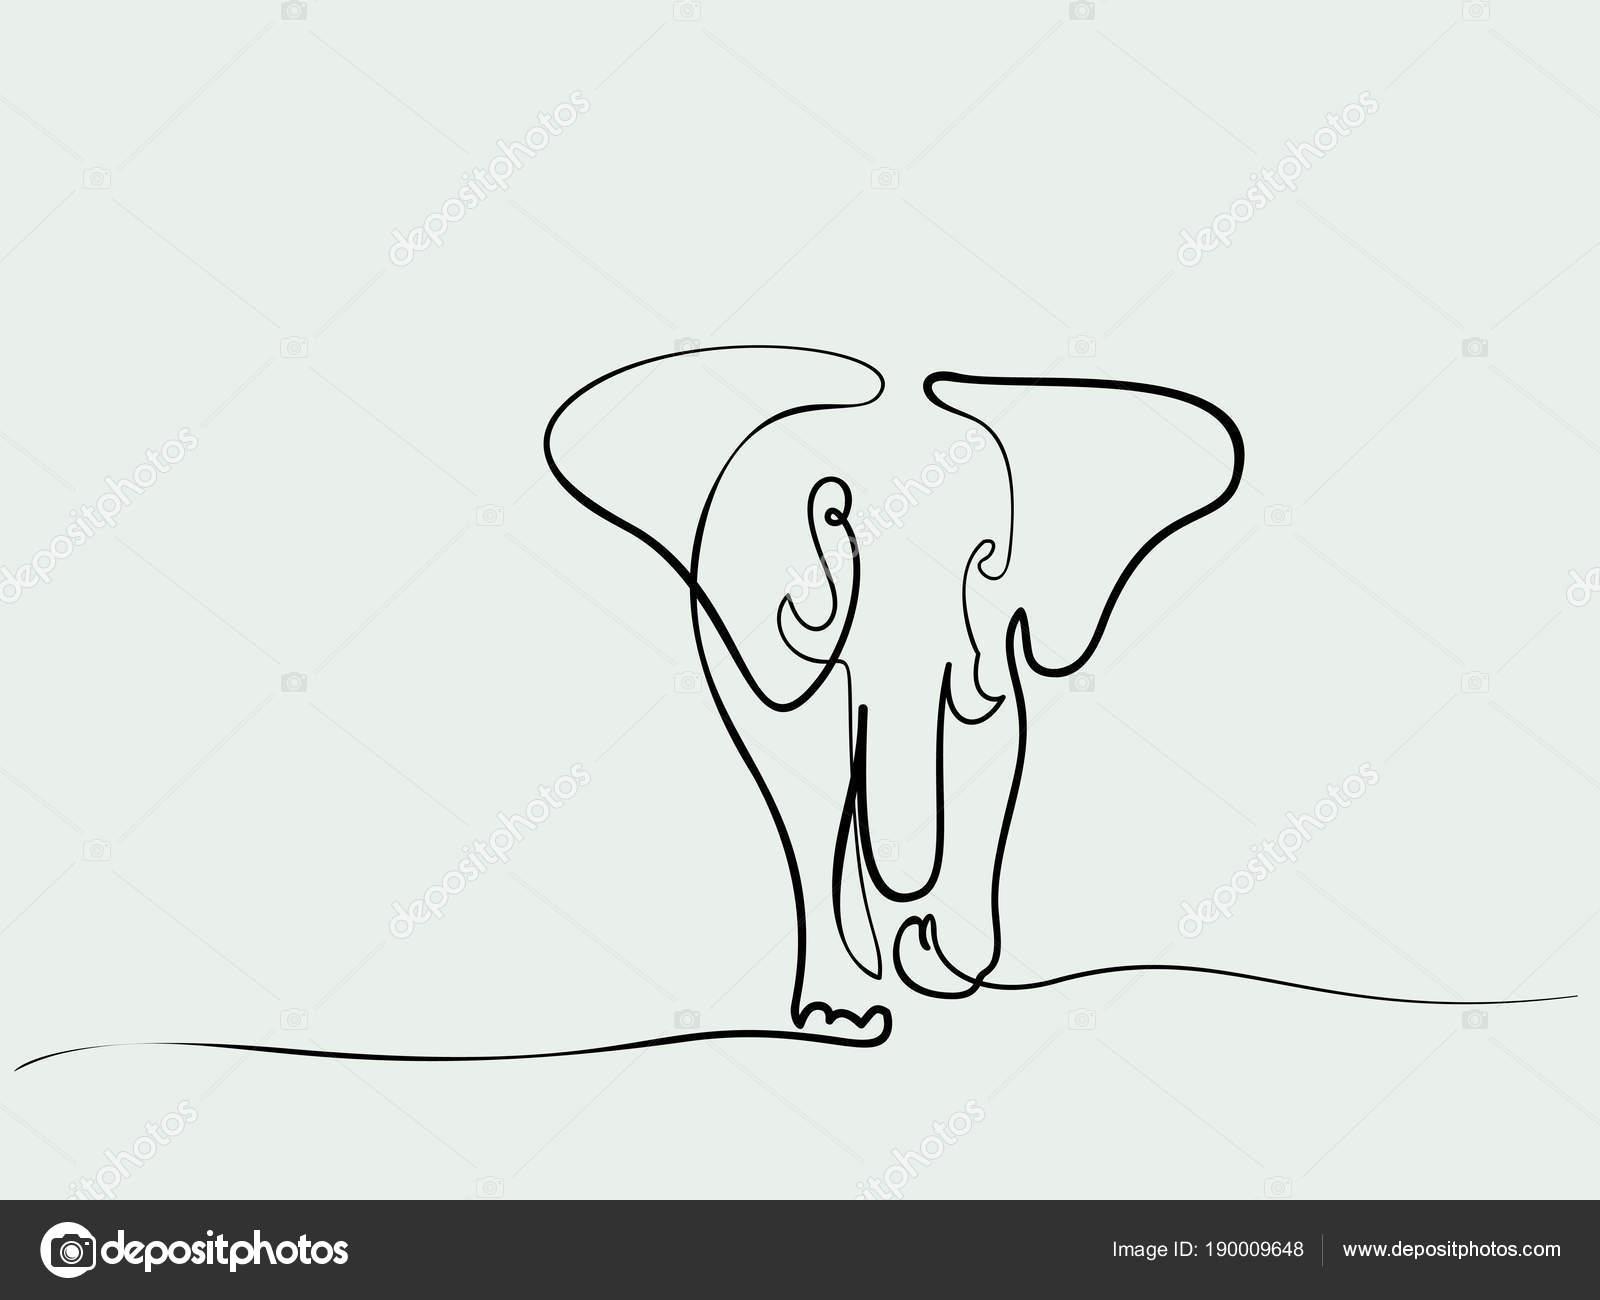 Elefanten zu Fuß symbol — Stockvektor © Valenty #190009648